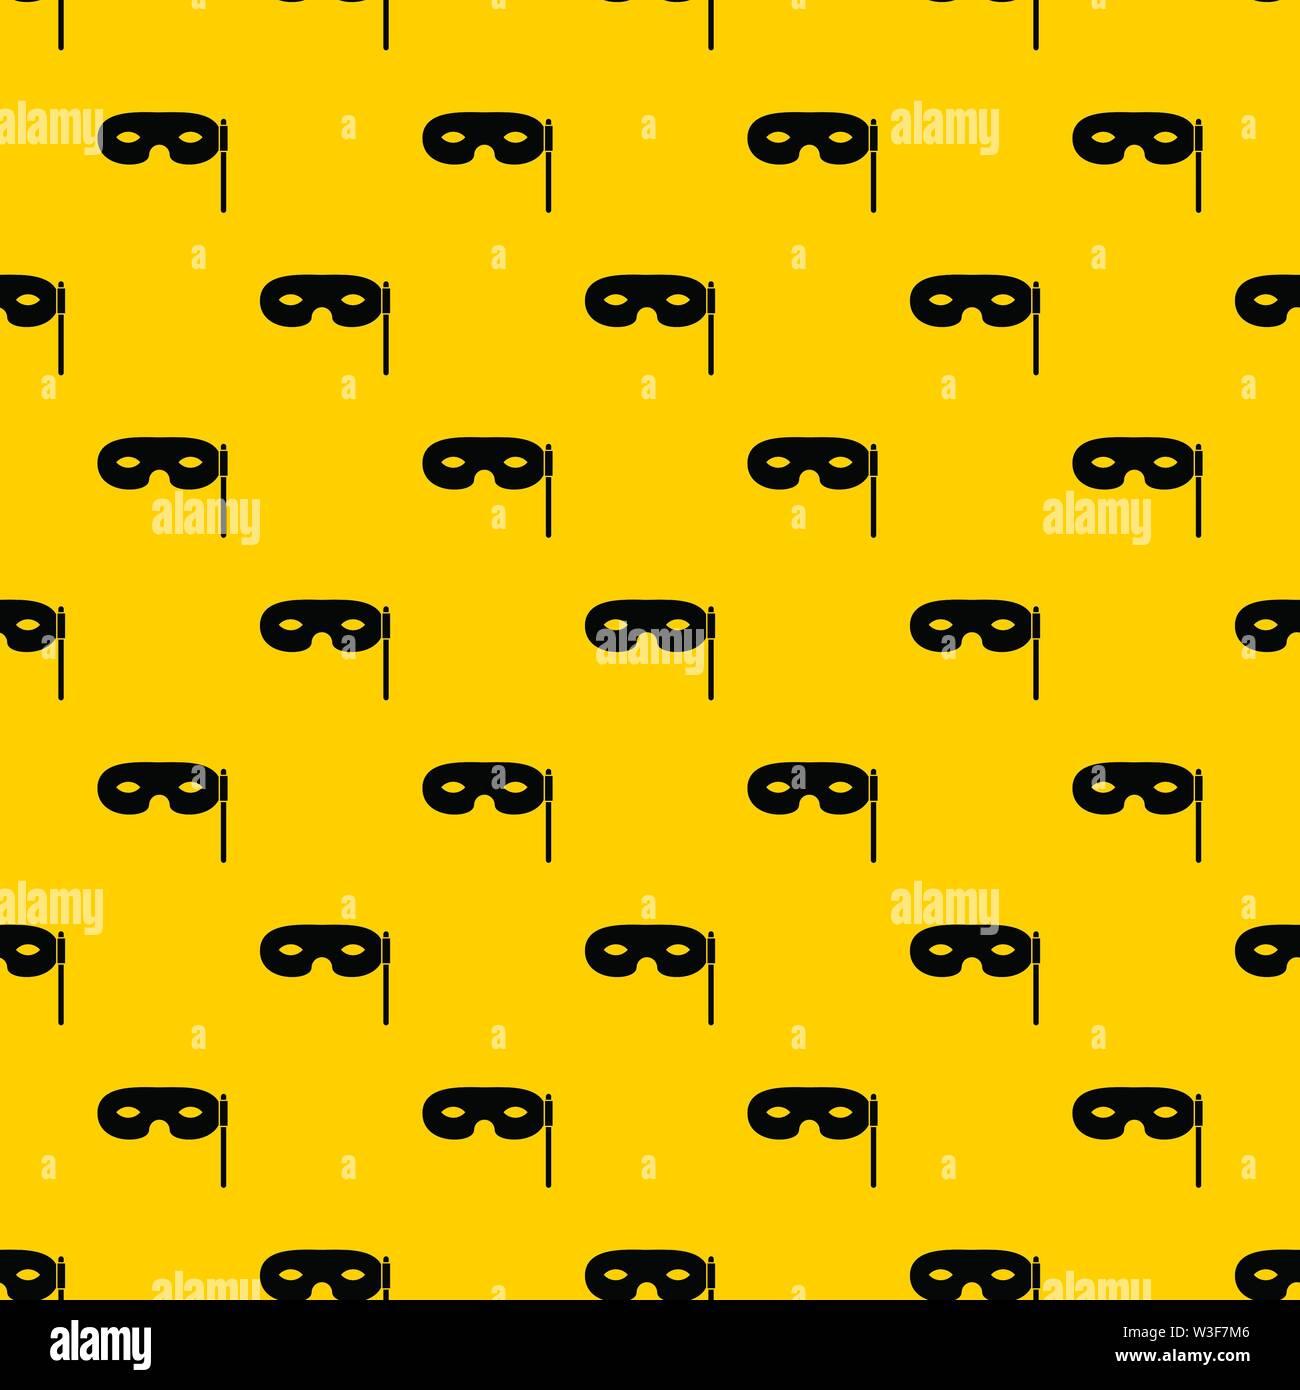 Carnival mask pattern vector - Stock Image